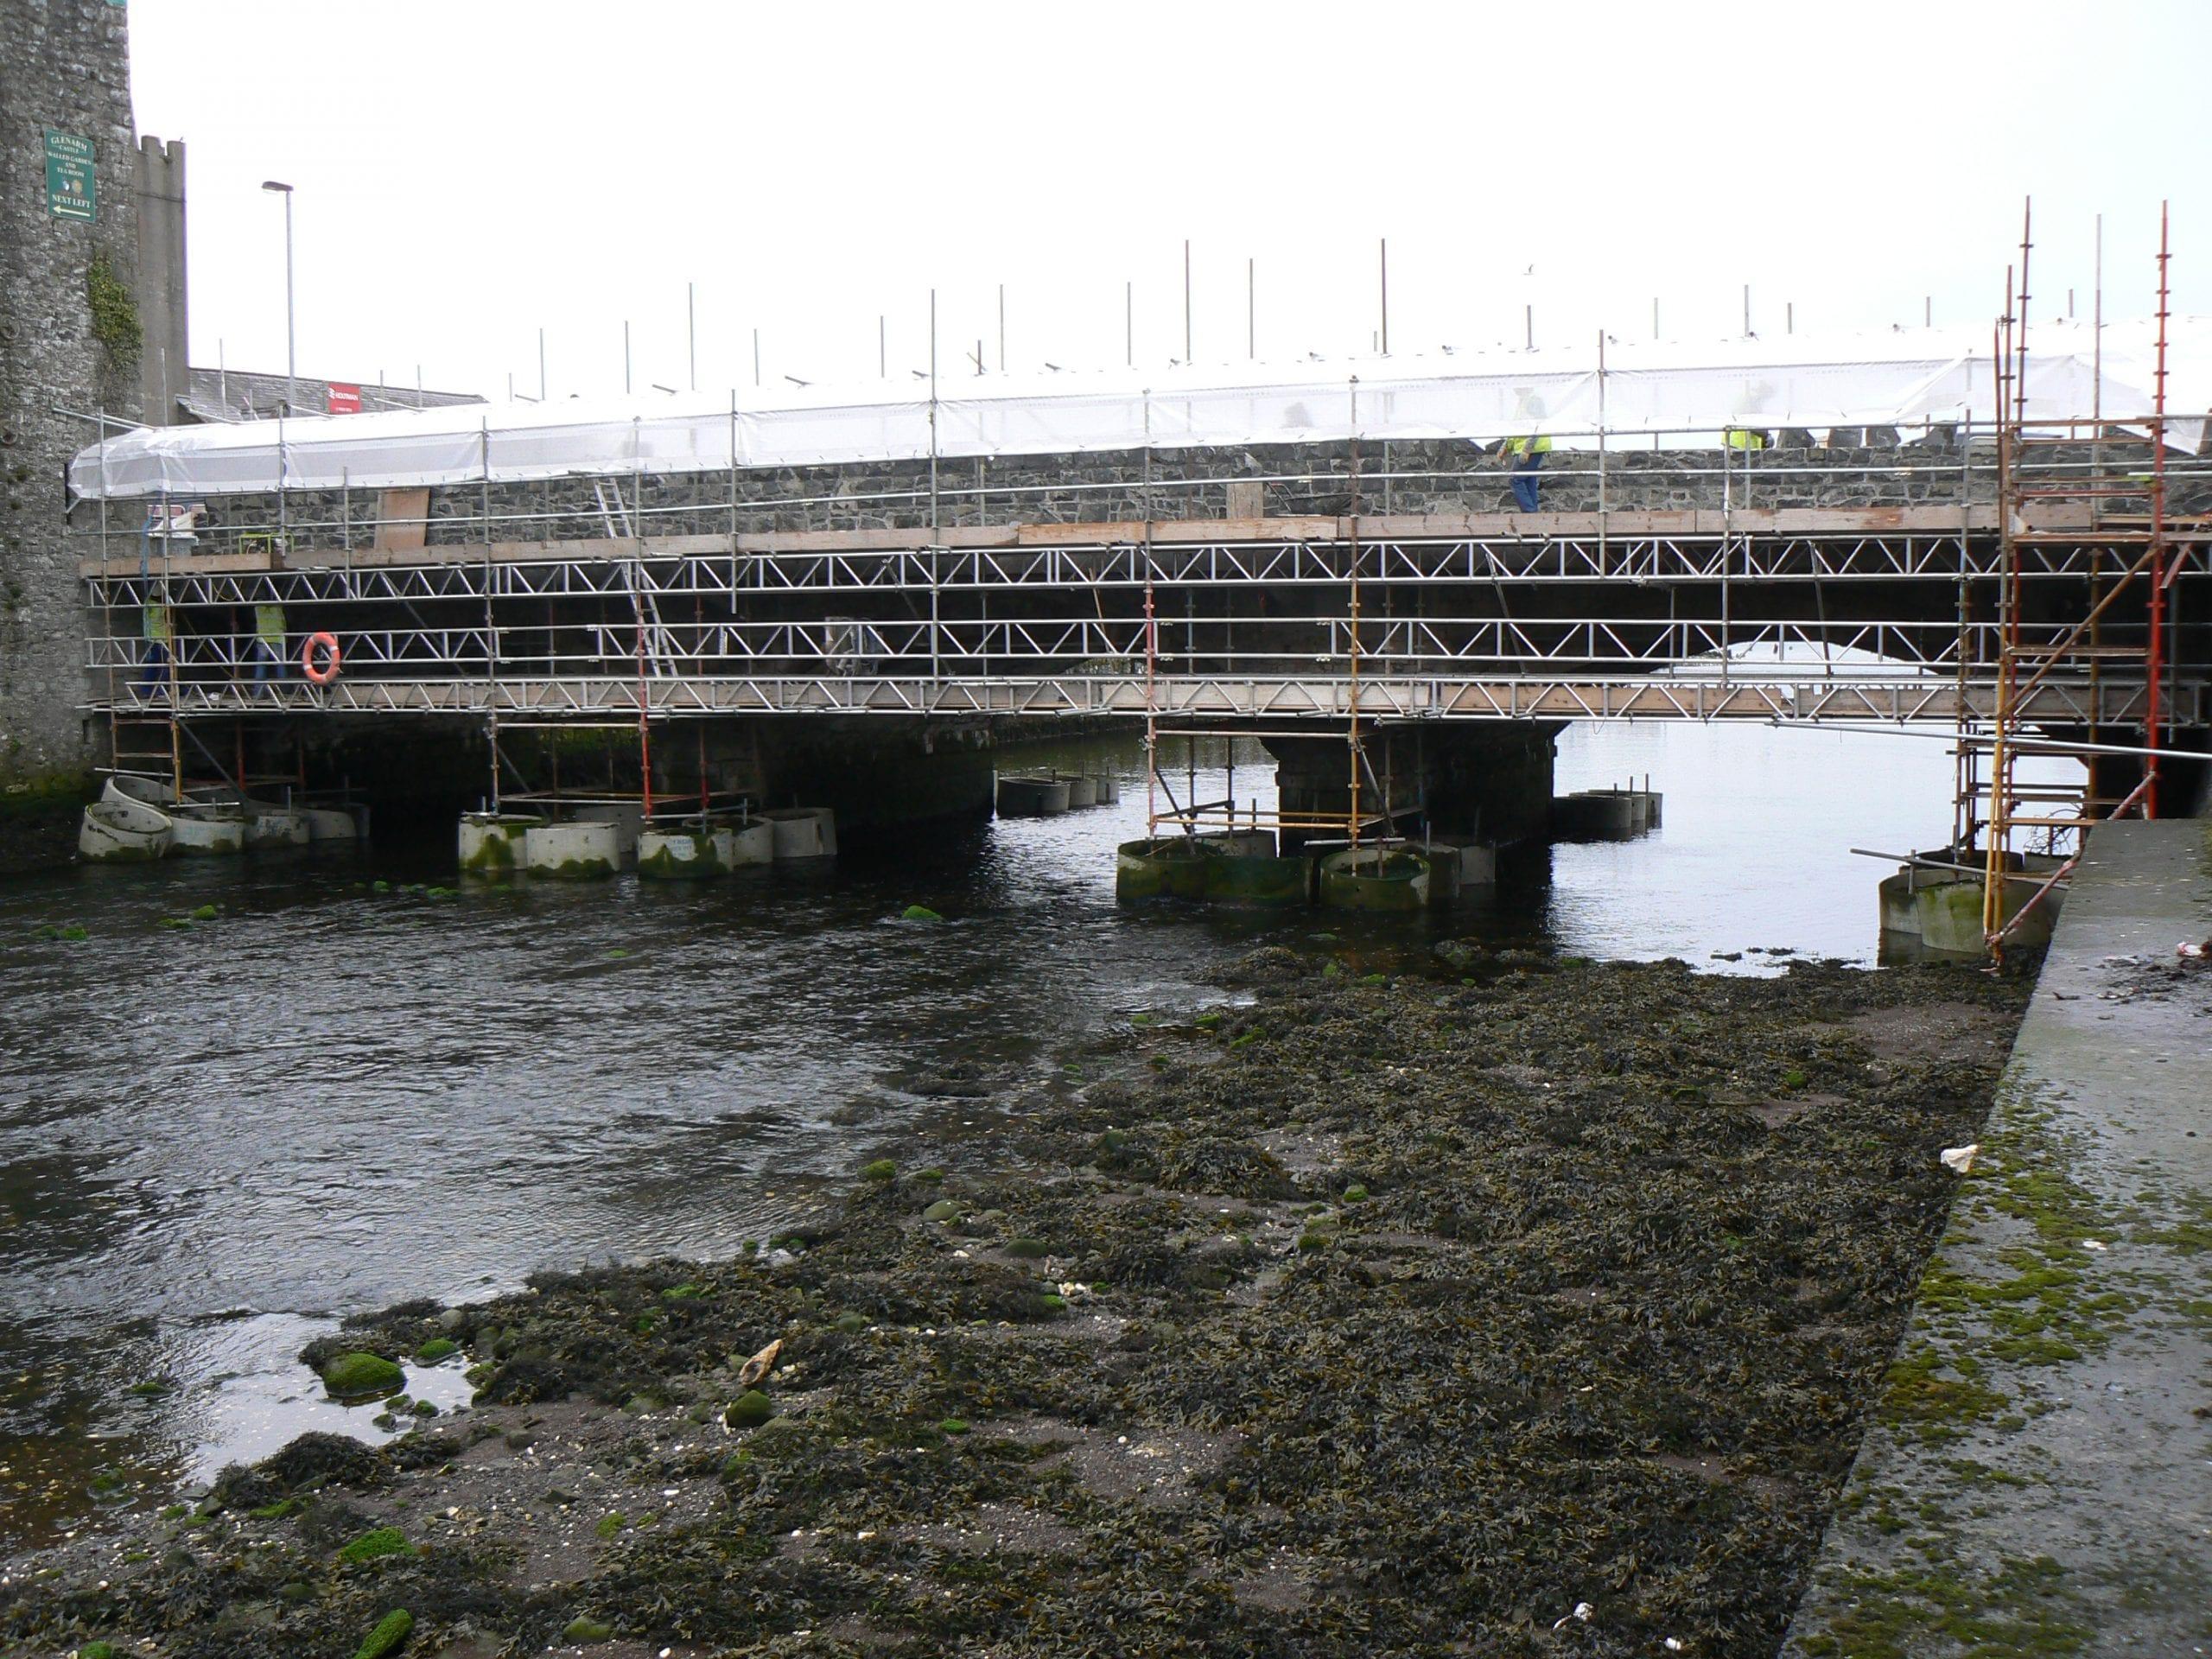 glenarm castle bridge Featured Image